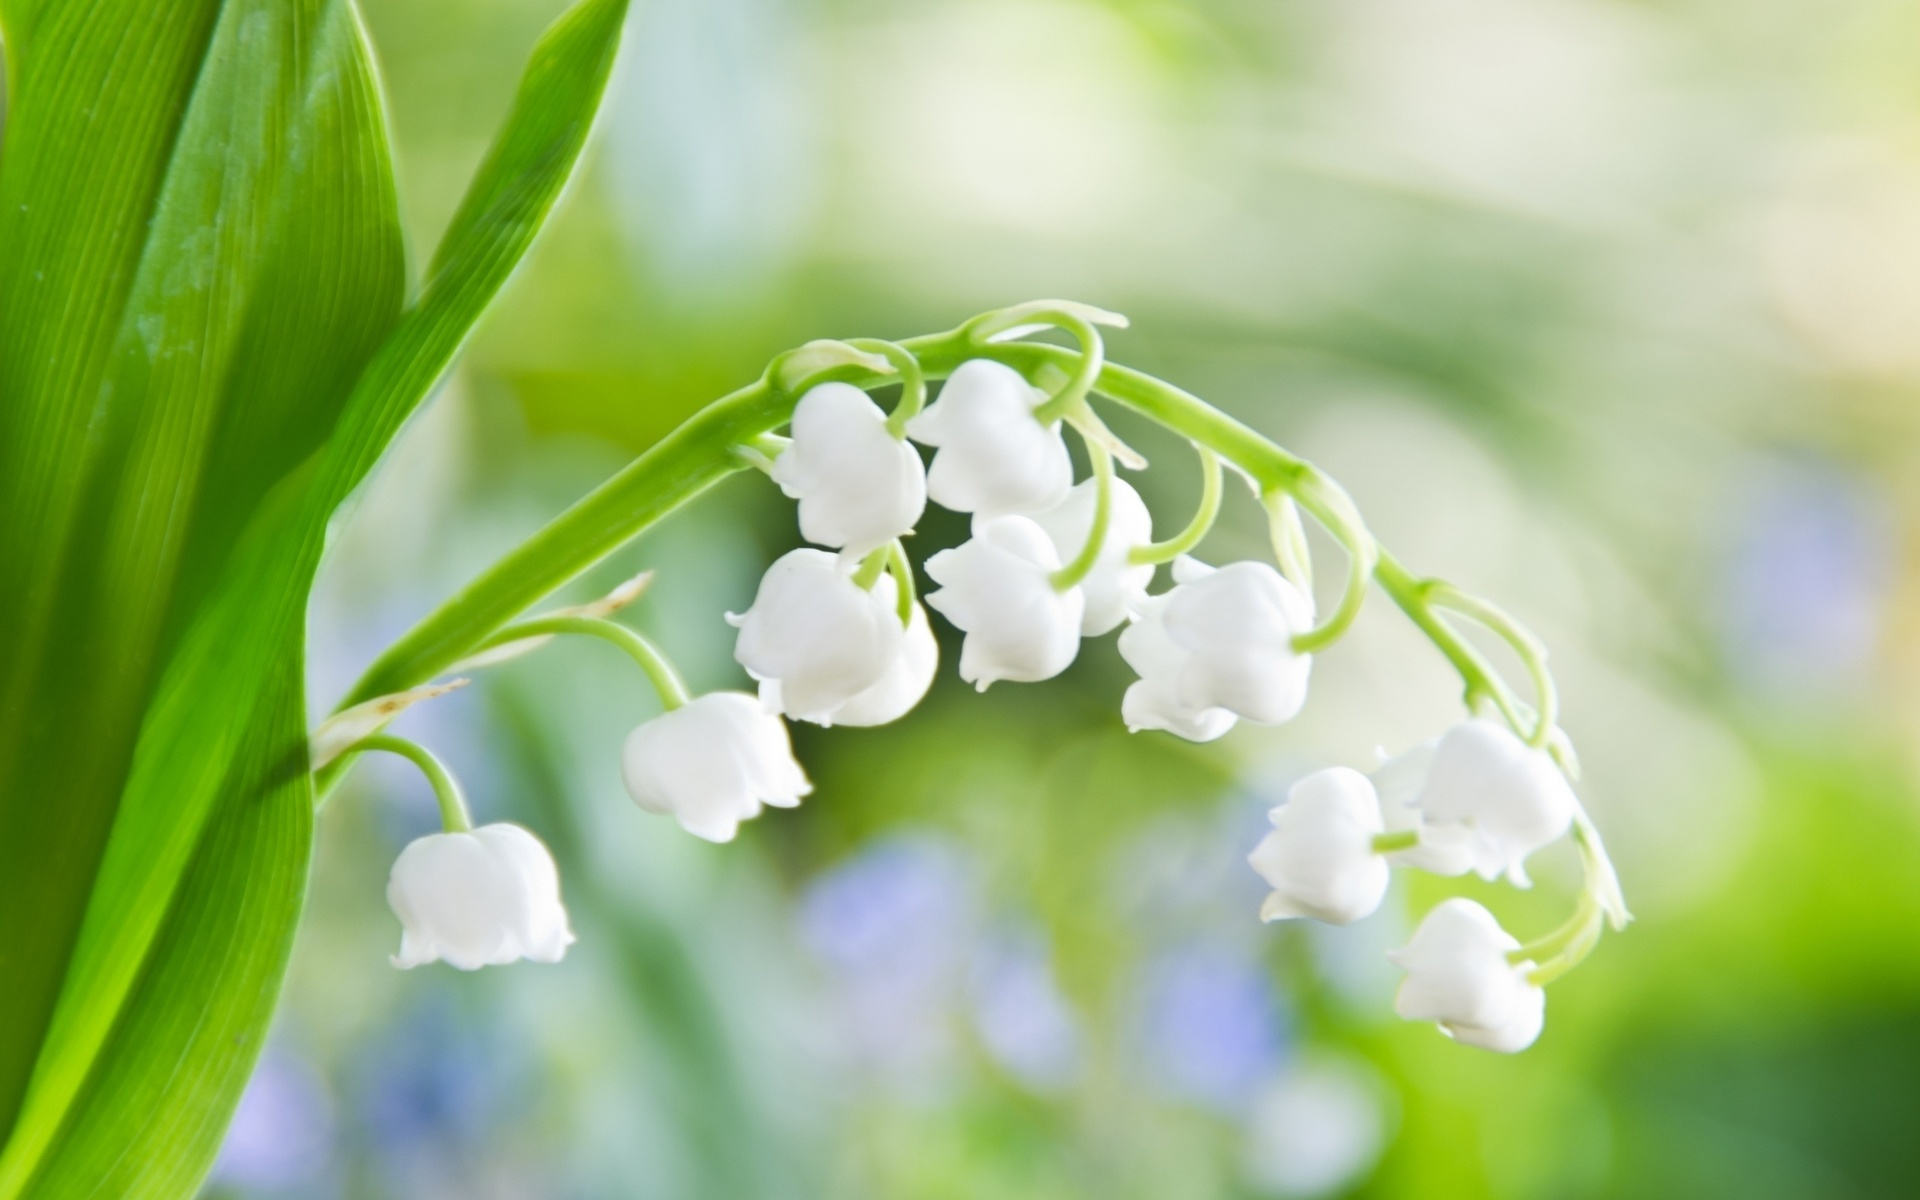 весенние цветы фото: